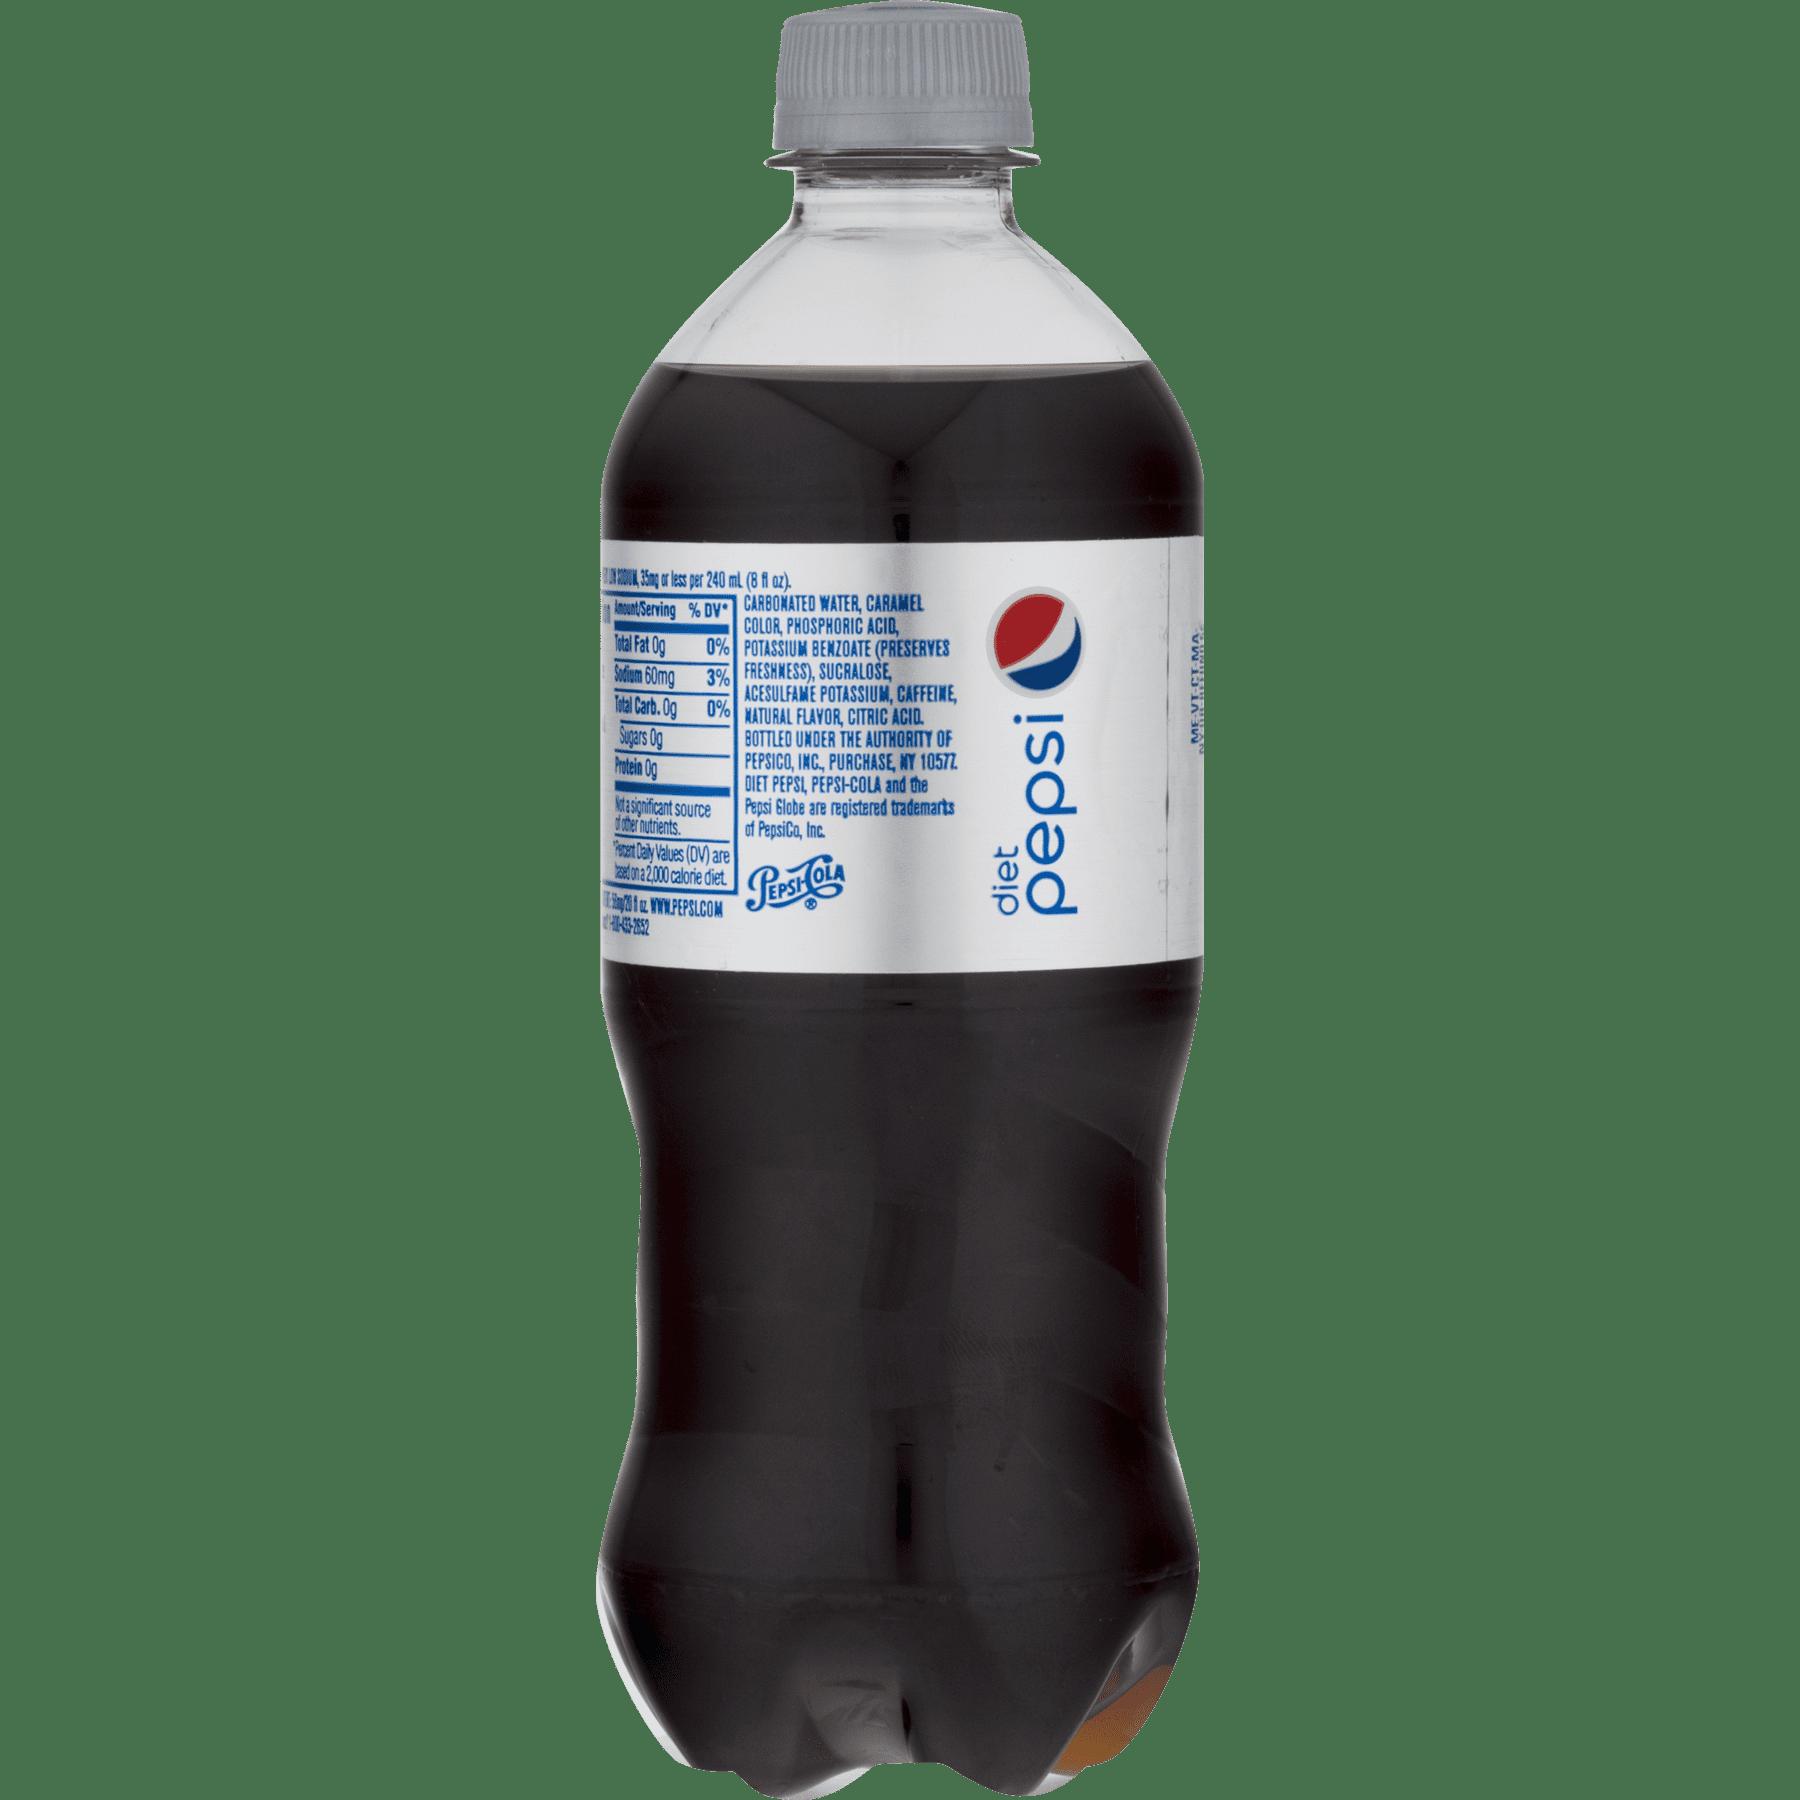 Diet Pepsi Cola 20 fl. oz. Plastic Bottle - Walmart.com